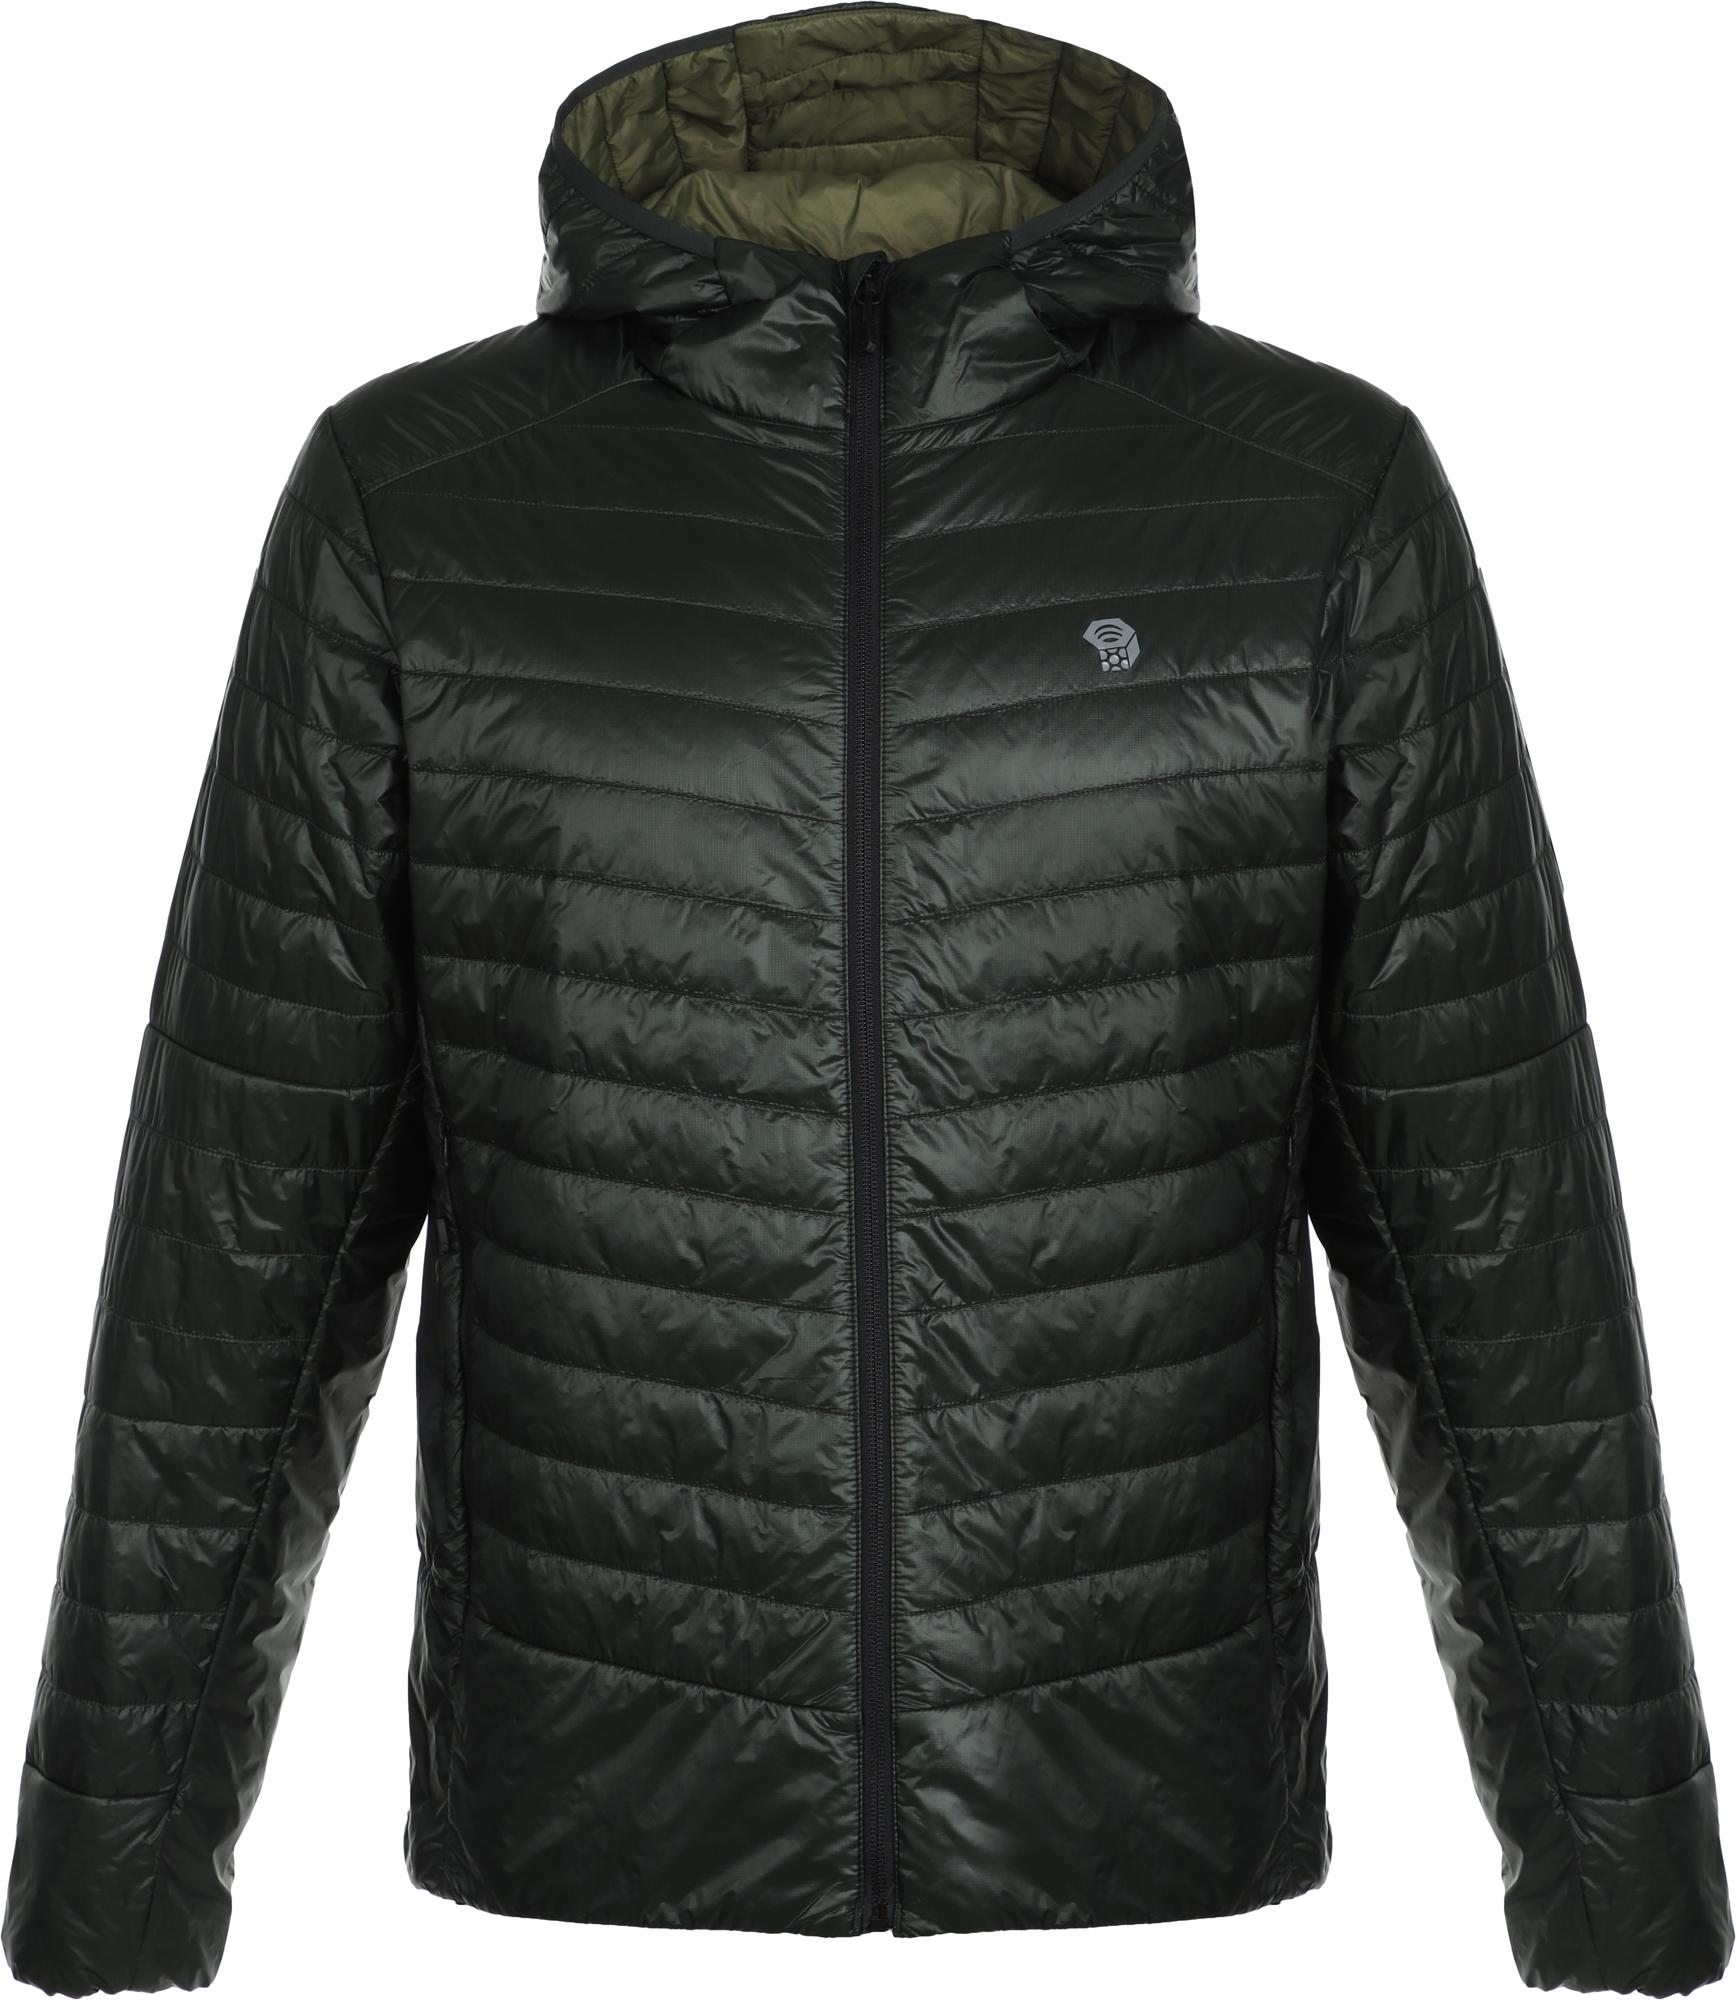 Mountain Hardwear Куртка утепленная мужская Mountain Hardwear Ghost Shadow™, размер 48 mountain hardwear куртка утепленная мужская mountain hardwear ghost shadow™ размер 56